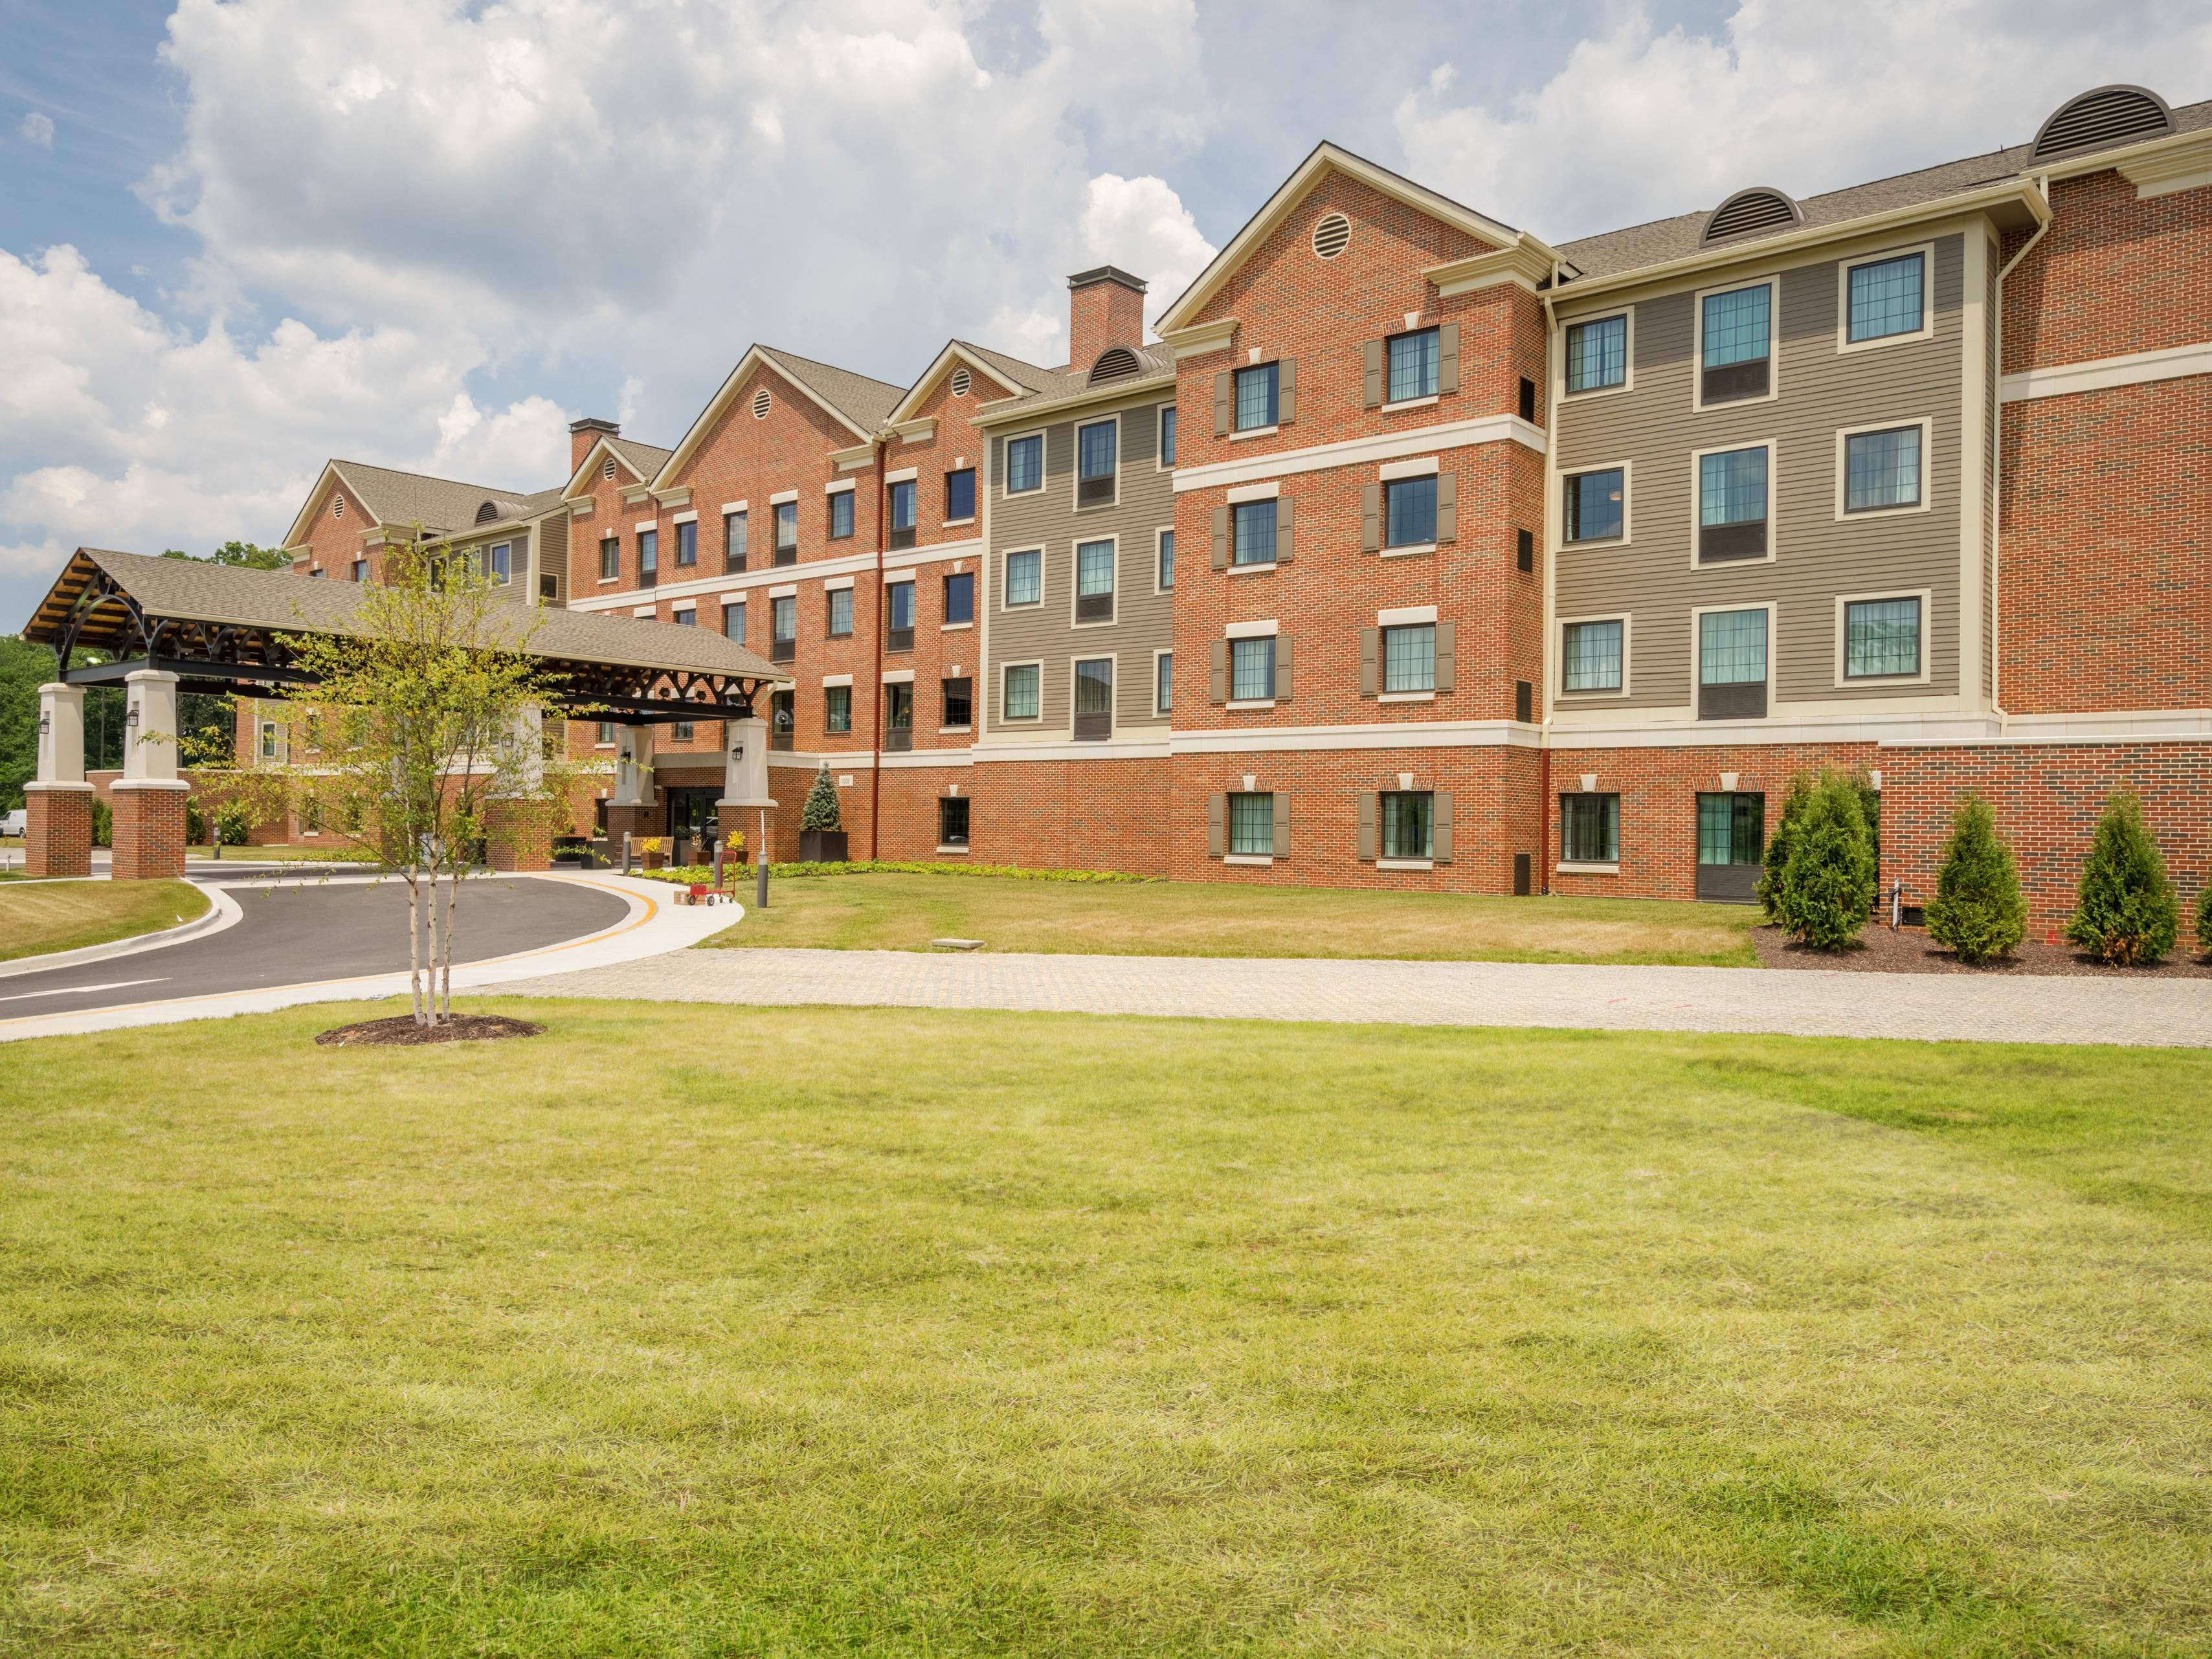 Staybridge Suites Building 1208 on Fort Belvoir